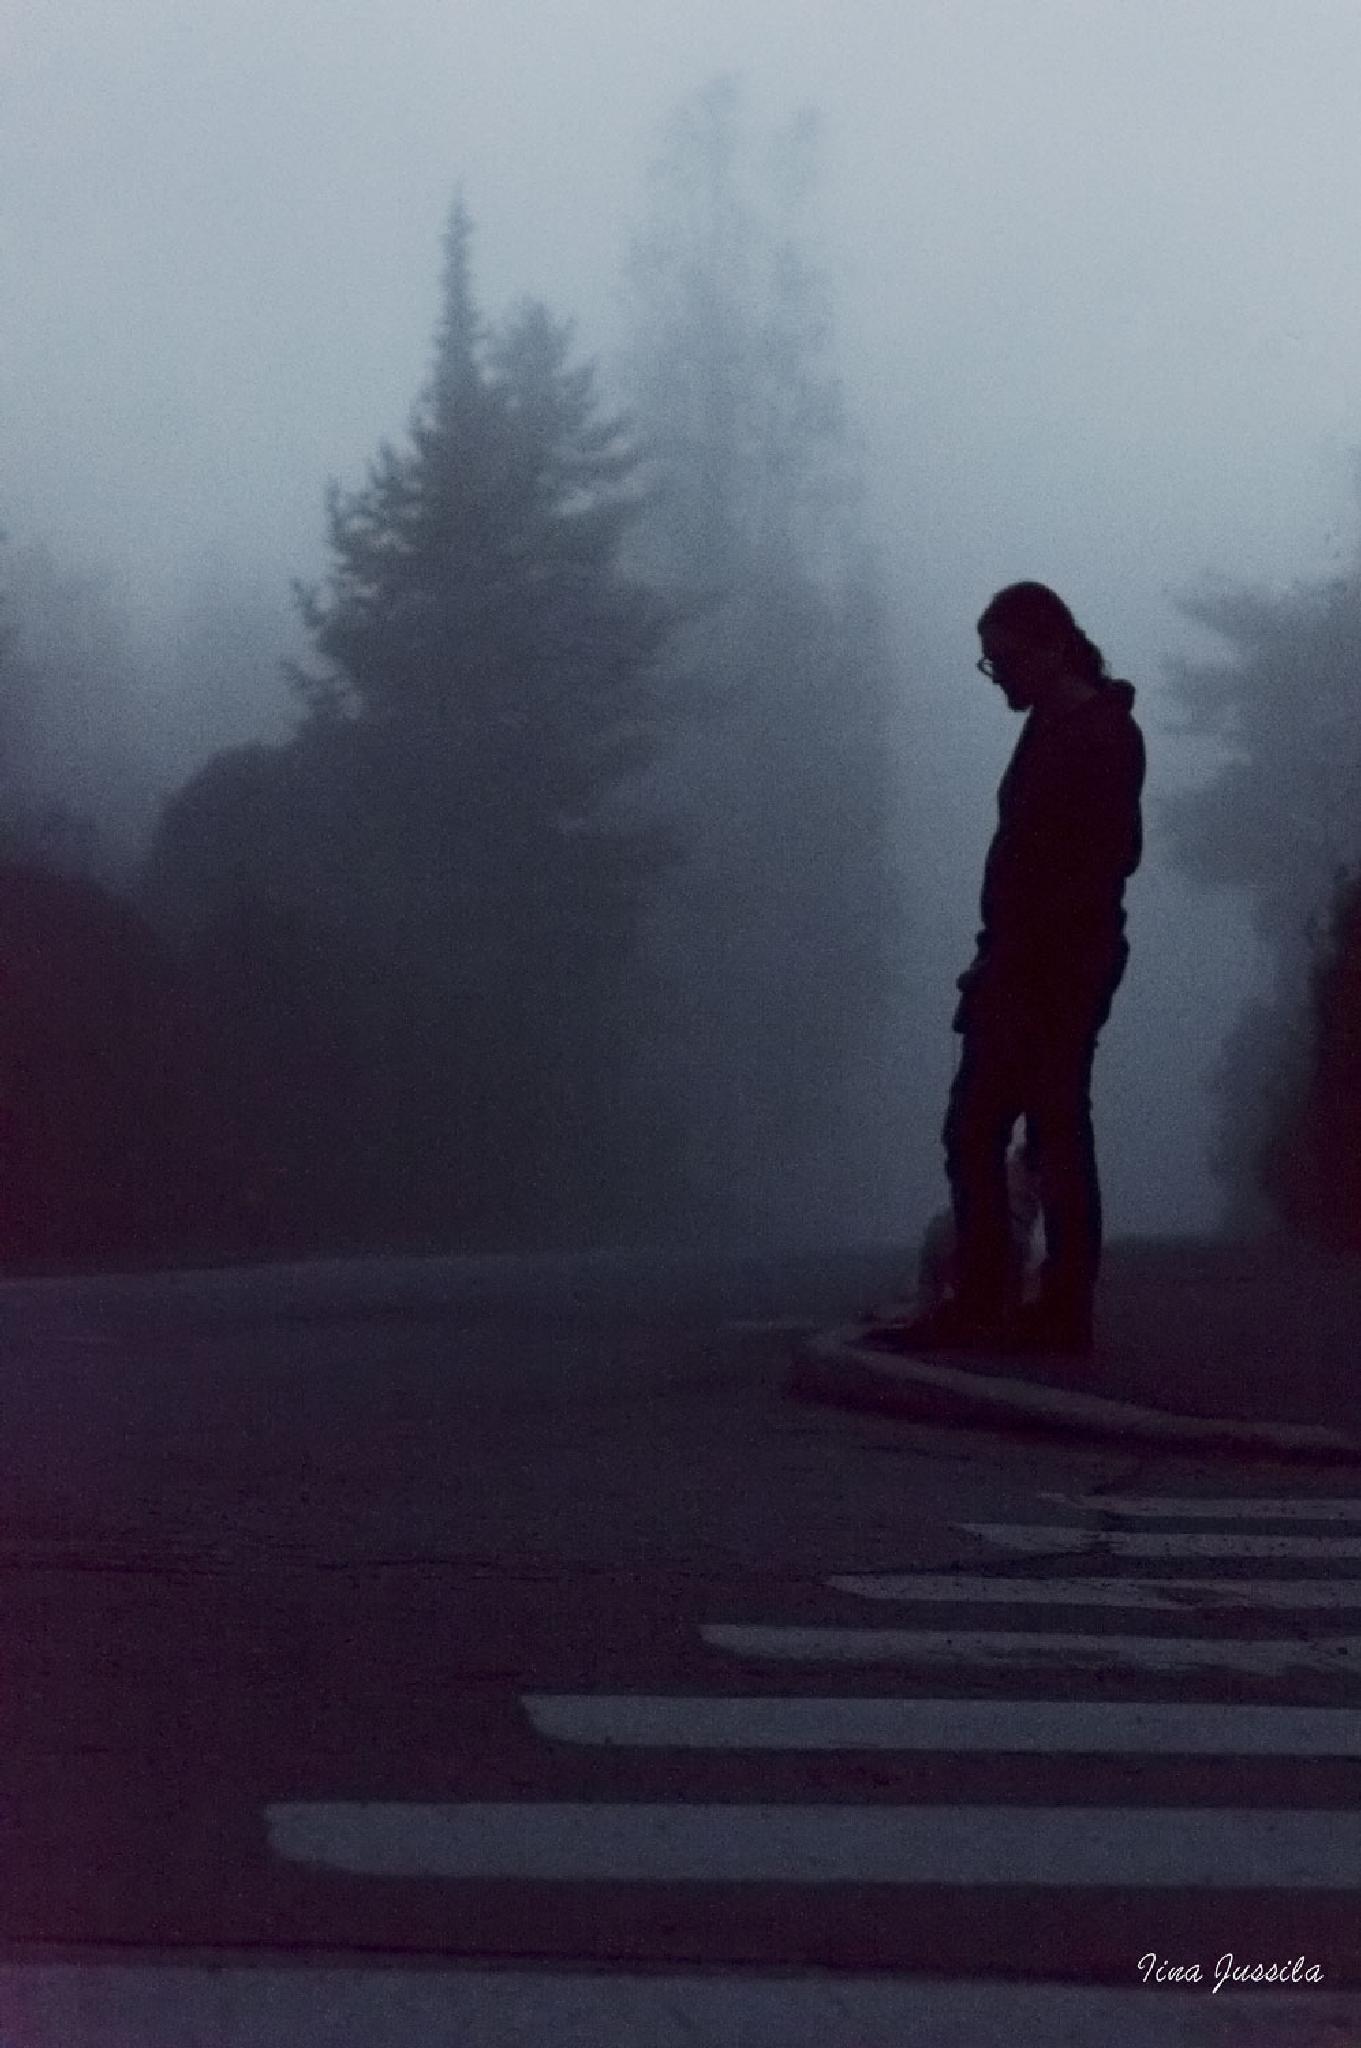 Misty night by Iina Jussila